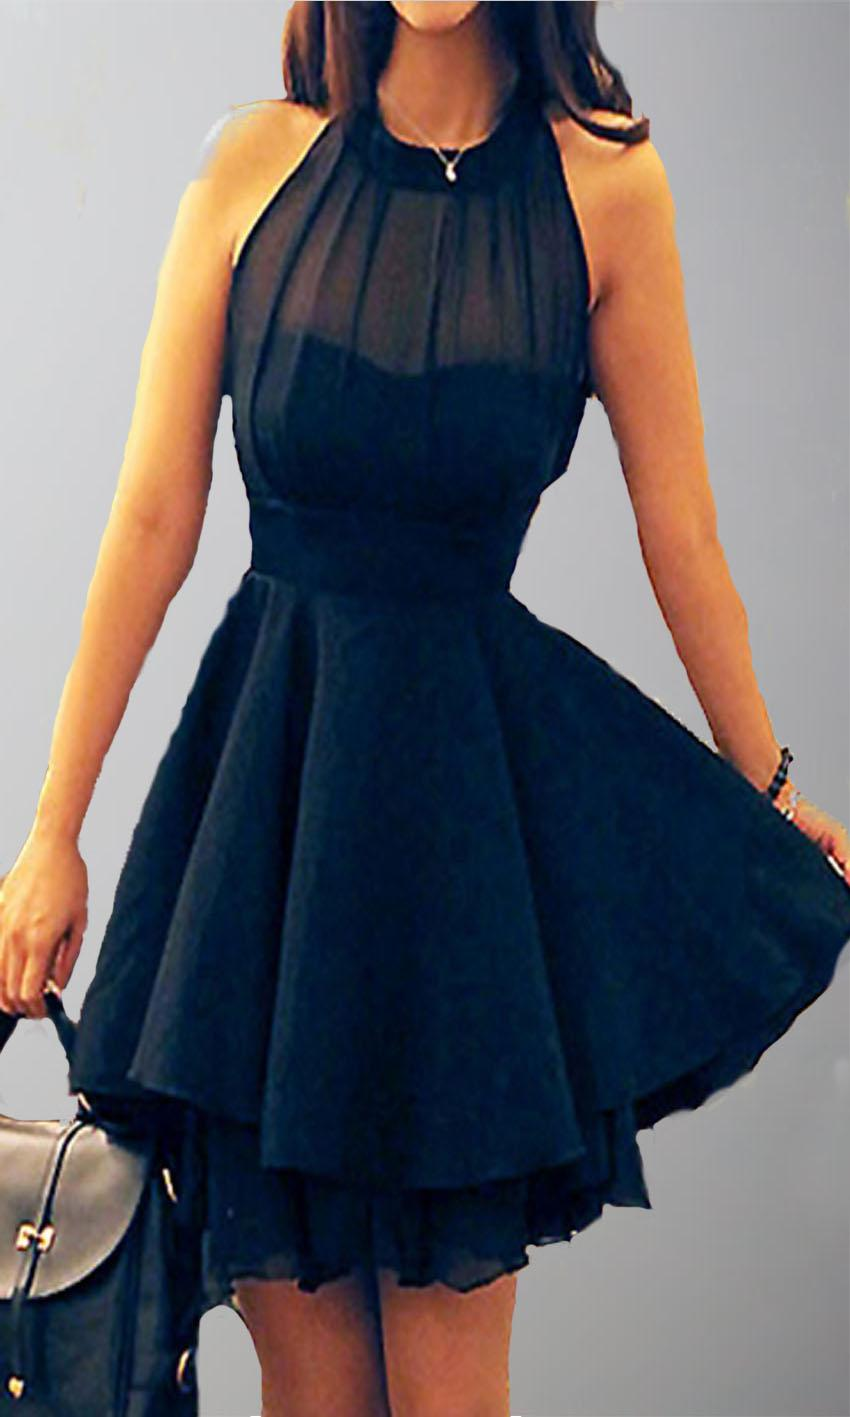 Sexy Illusion Short Slim Summer Occasion Dresses UK KSP328 [KSP328 ...